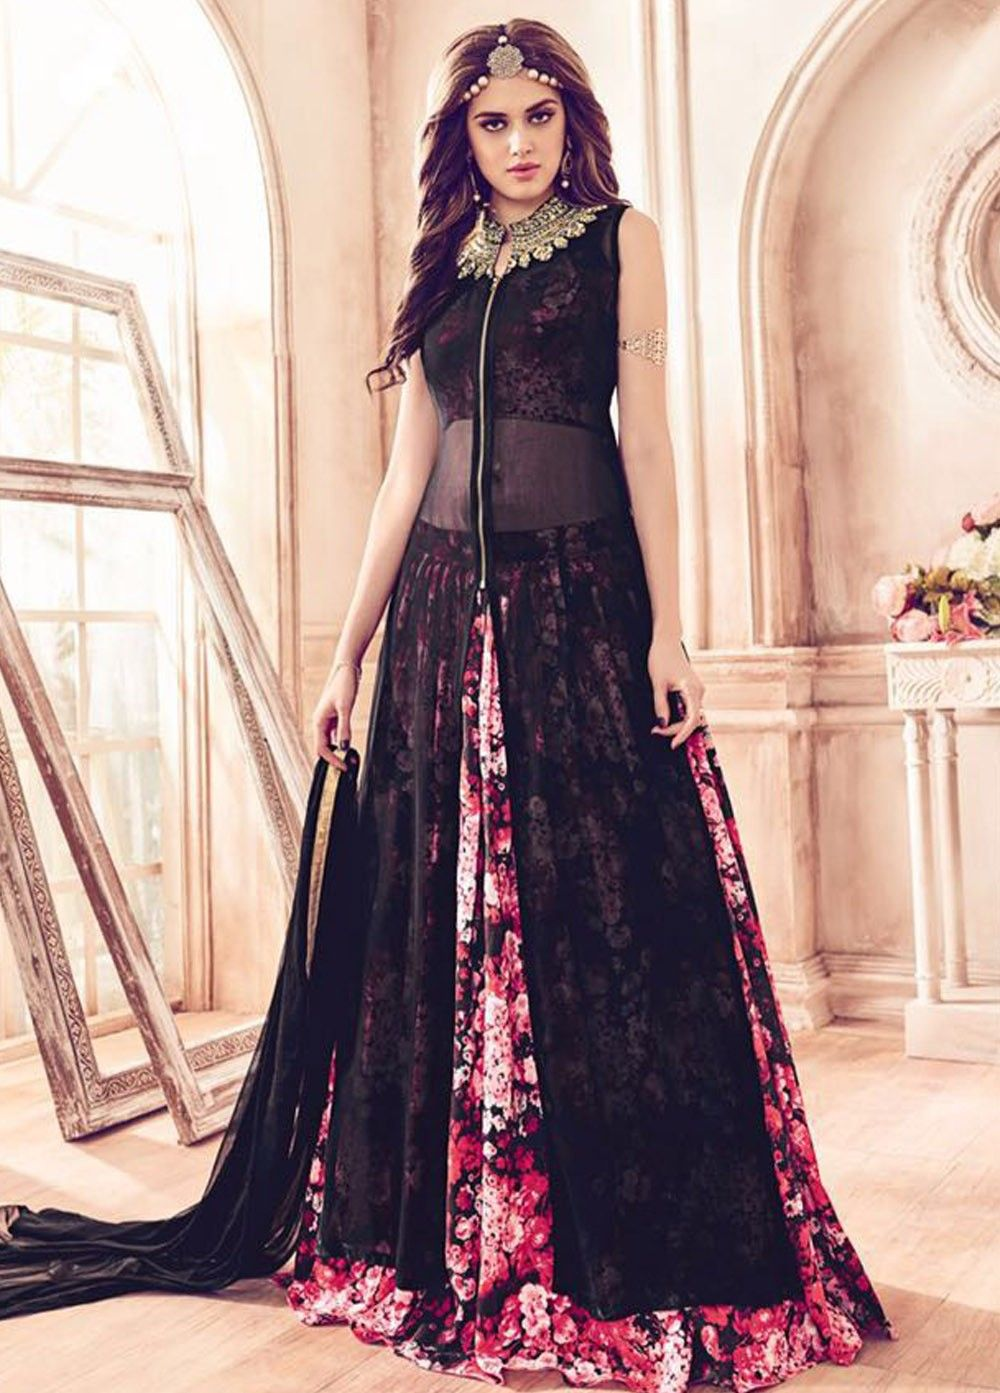 Dresses sarees suits lengha anarkali lehenga pink anarkali lehenga - Faux Georgette Black And Pink Lace Classic Lehenga Kameeze Salwar Suits Salwar Kameez Anarkali